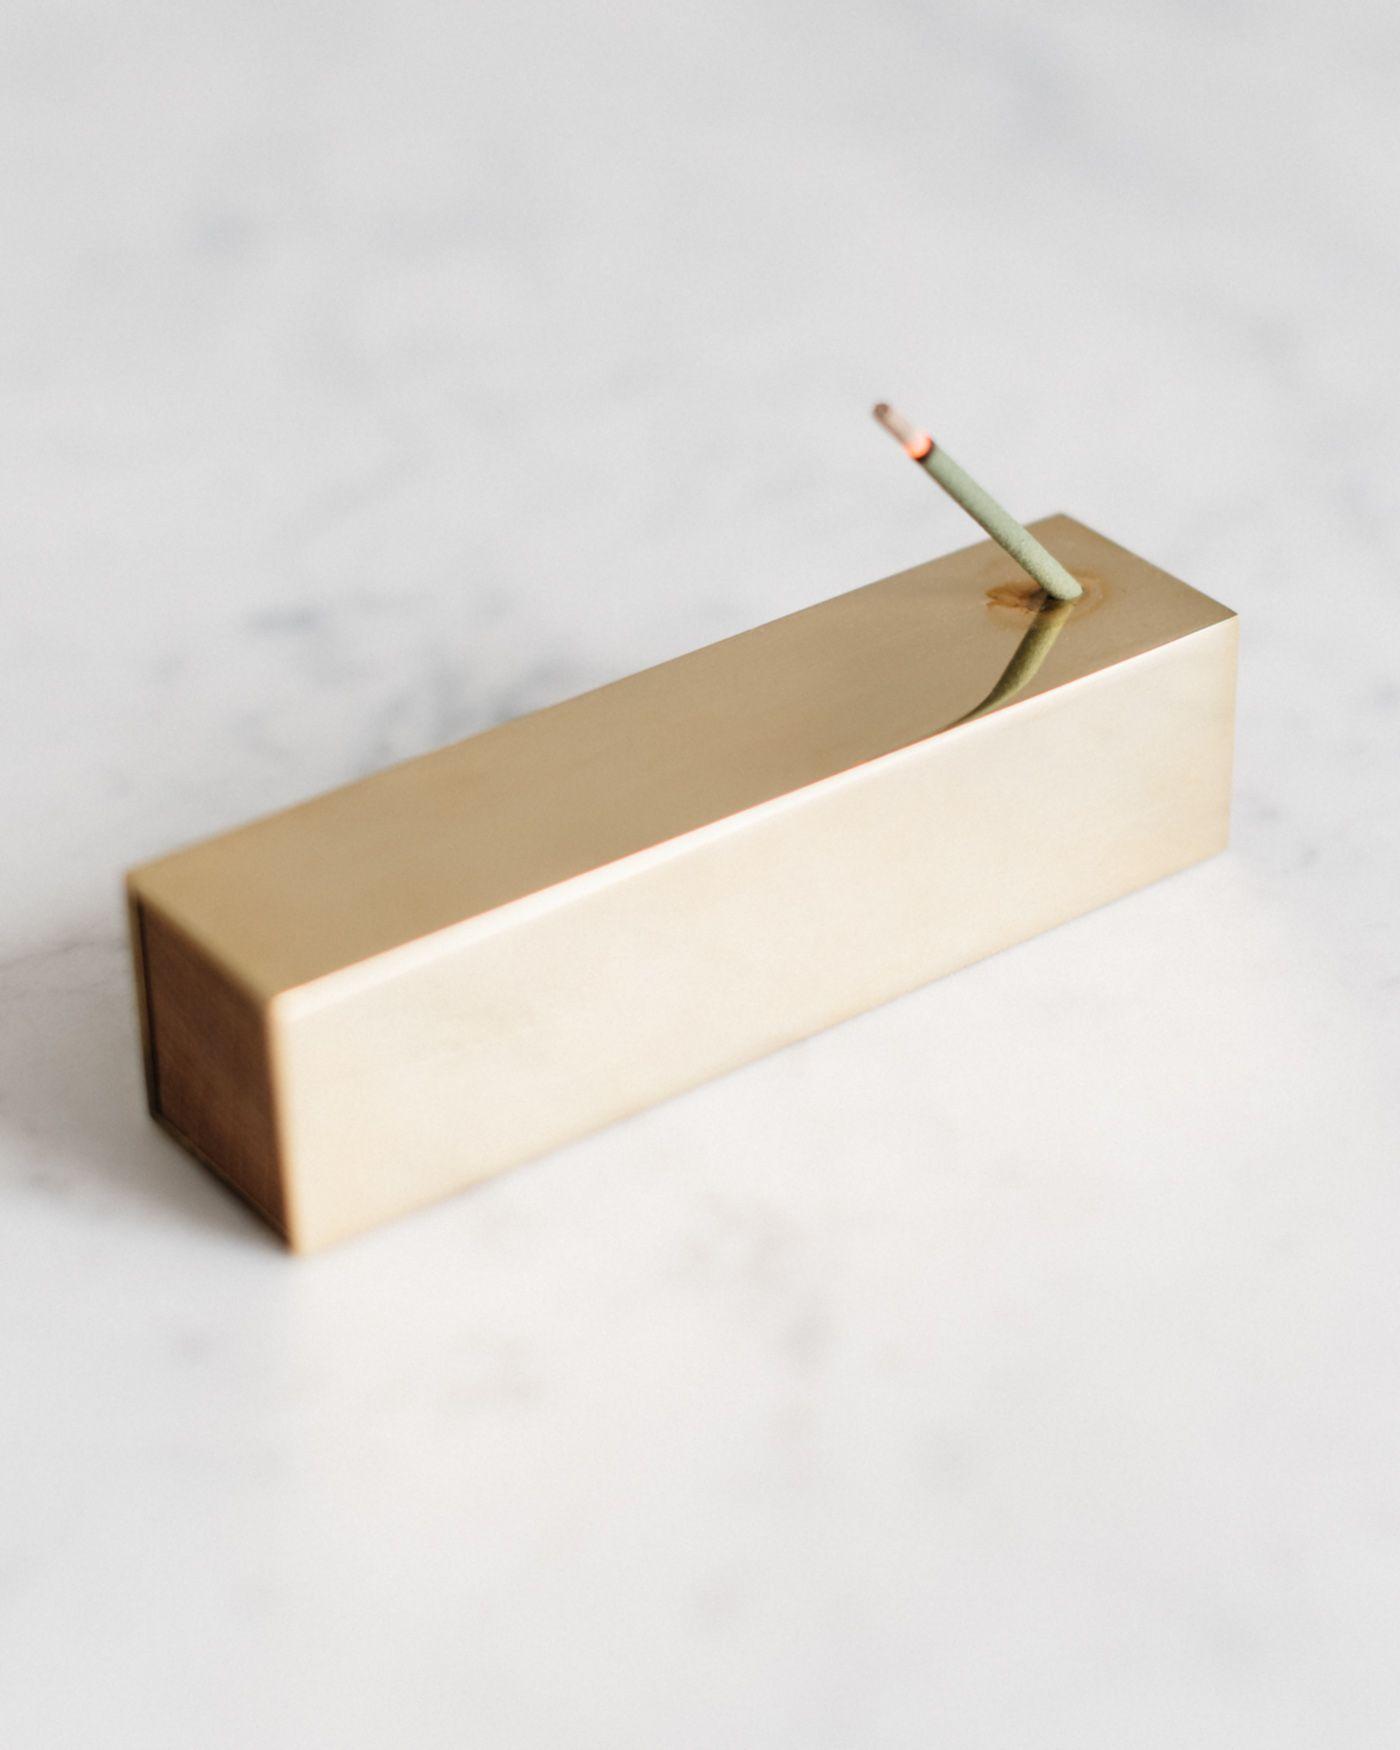 M i n u t e s – Brass incense burner by Monocle.